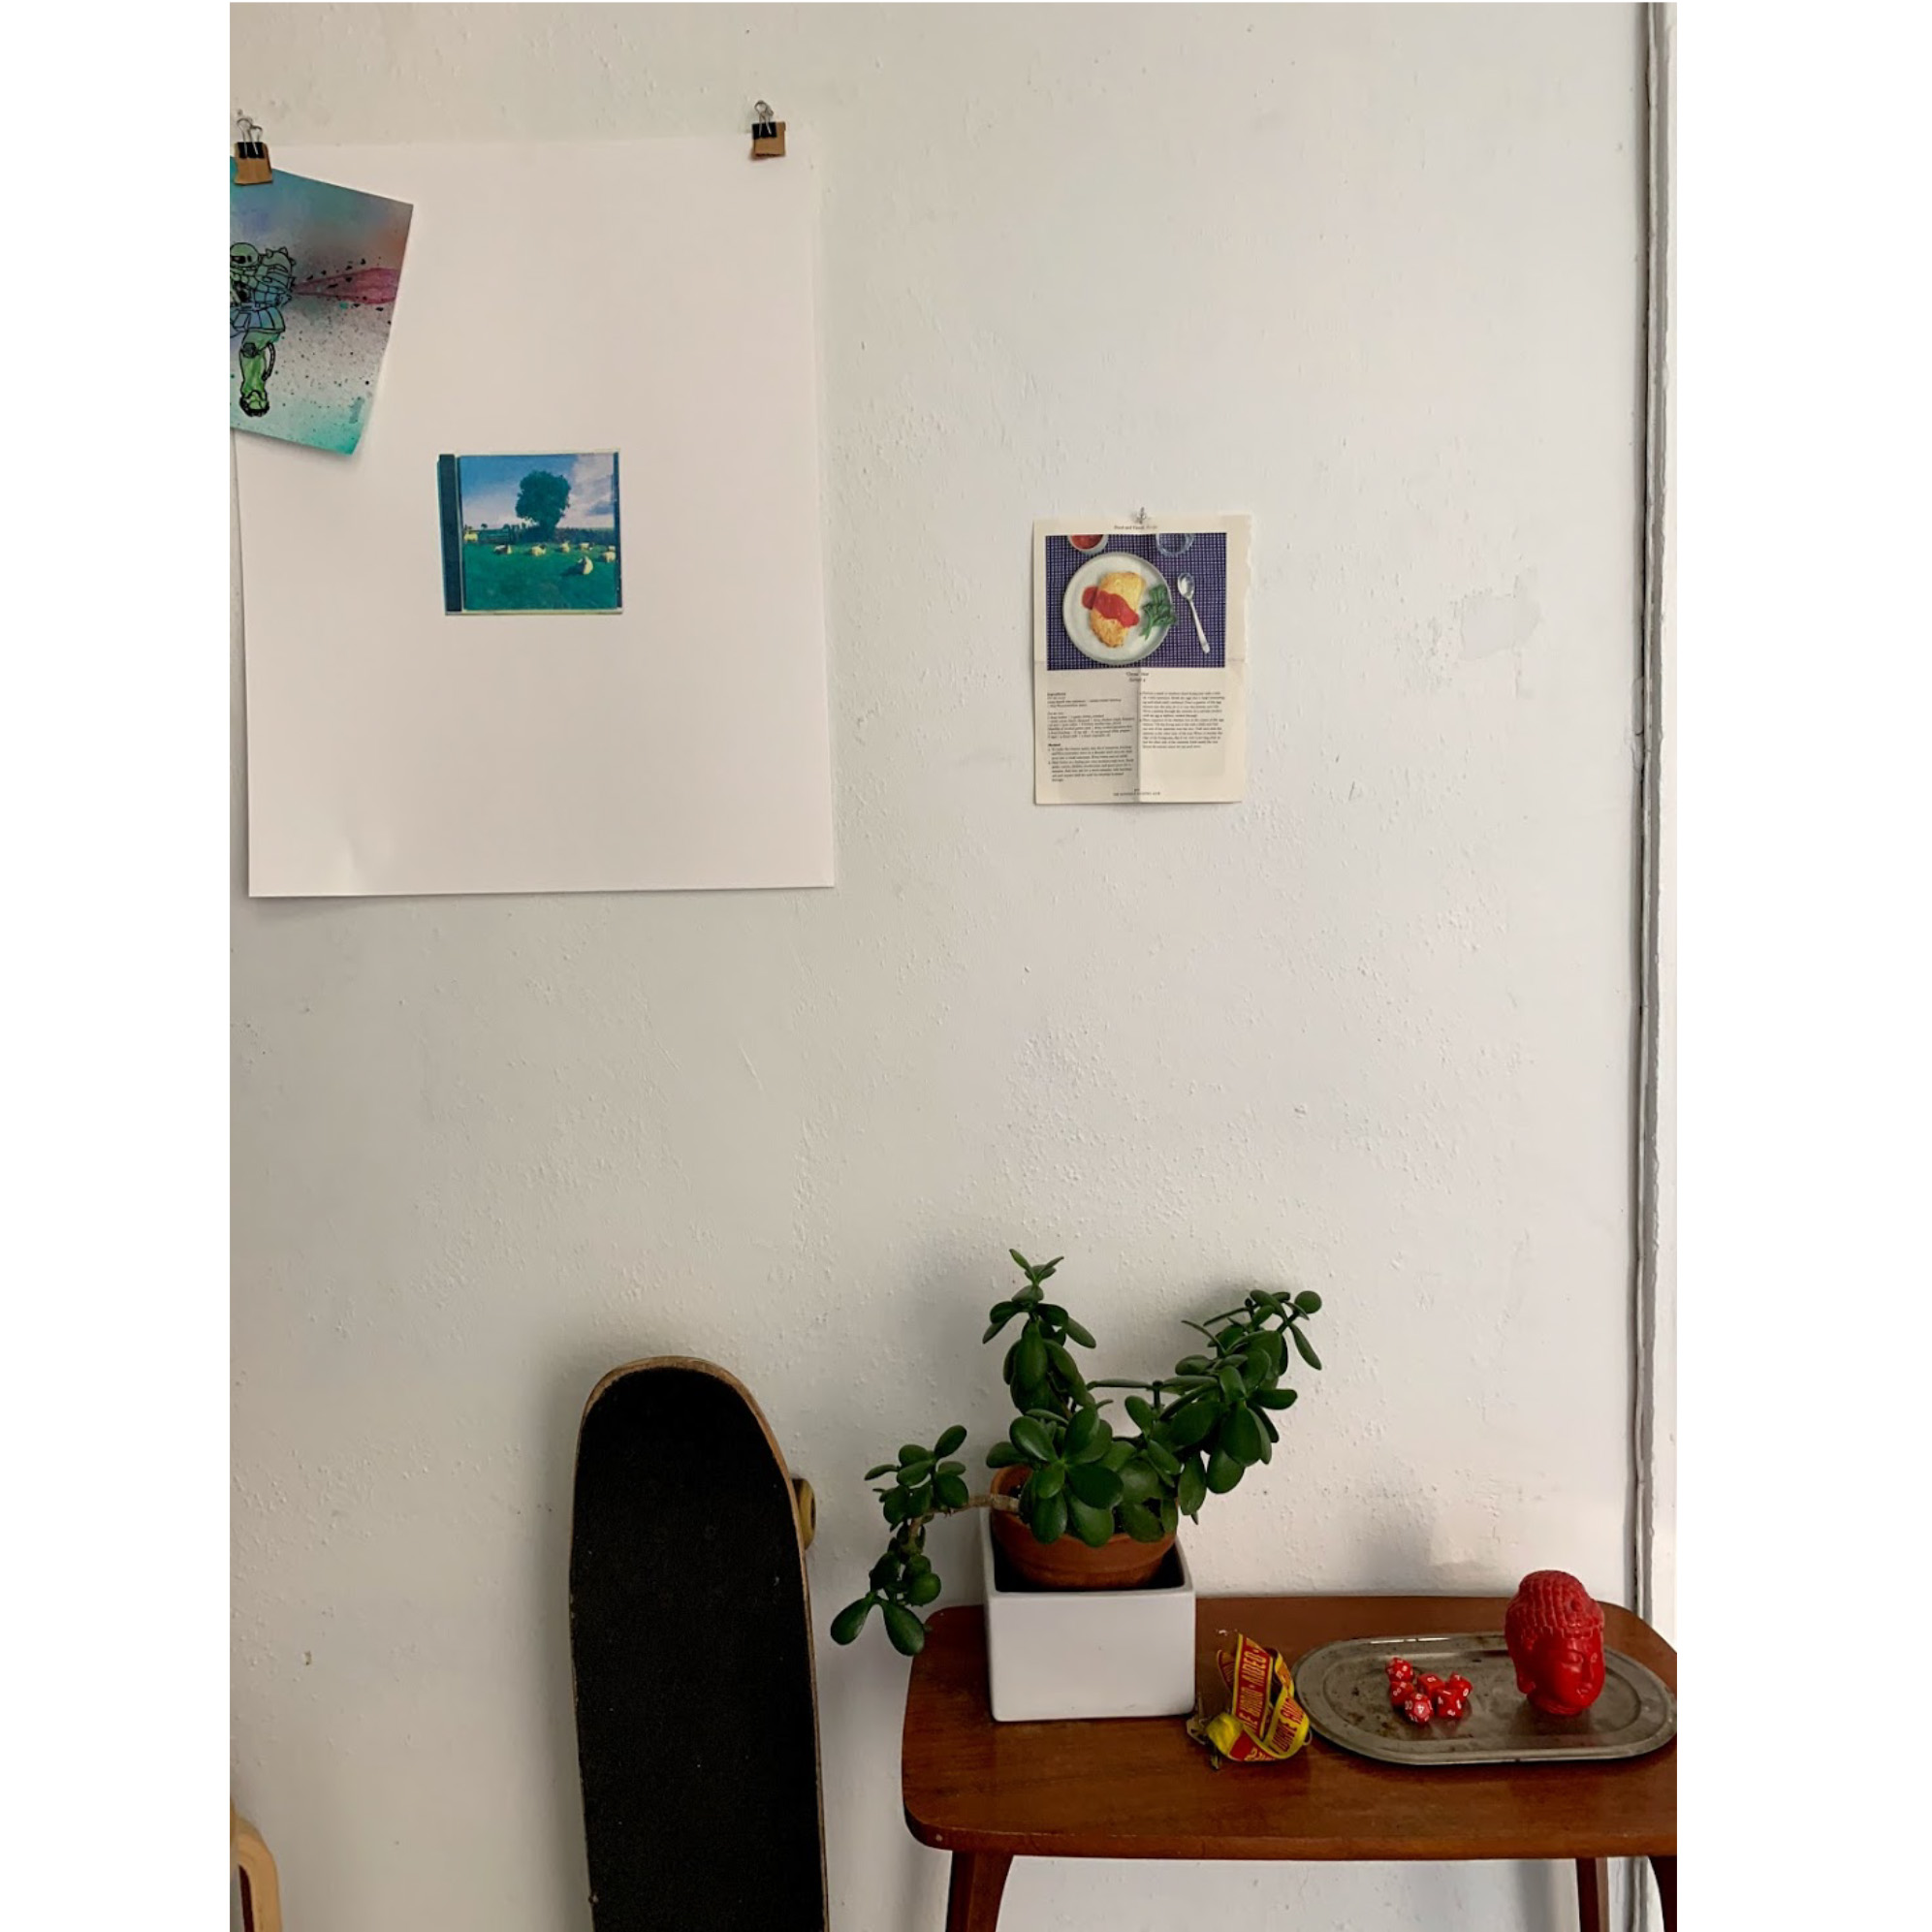 / - My studio in MacArthur Park , Los Angeles.